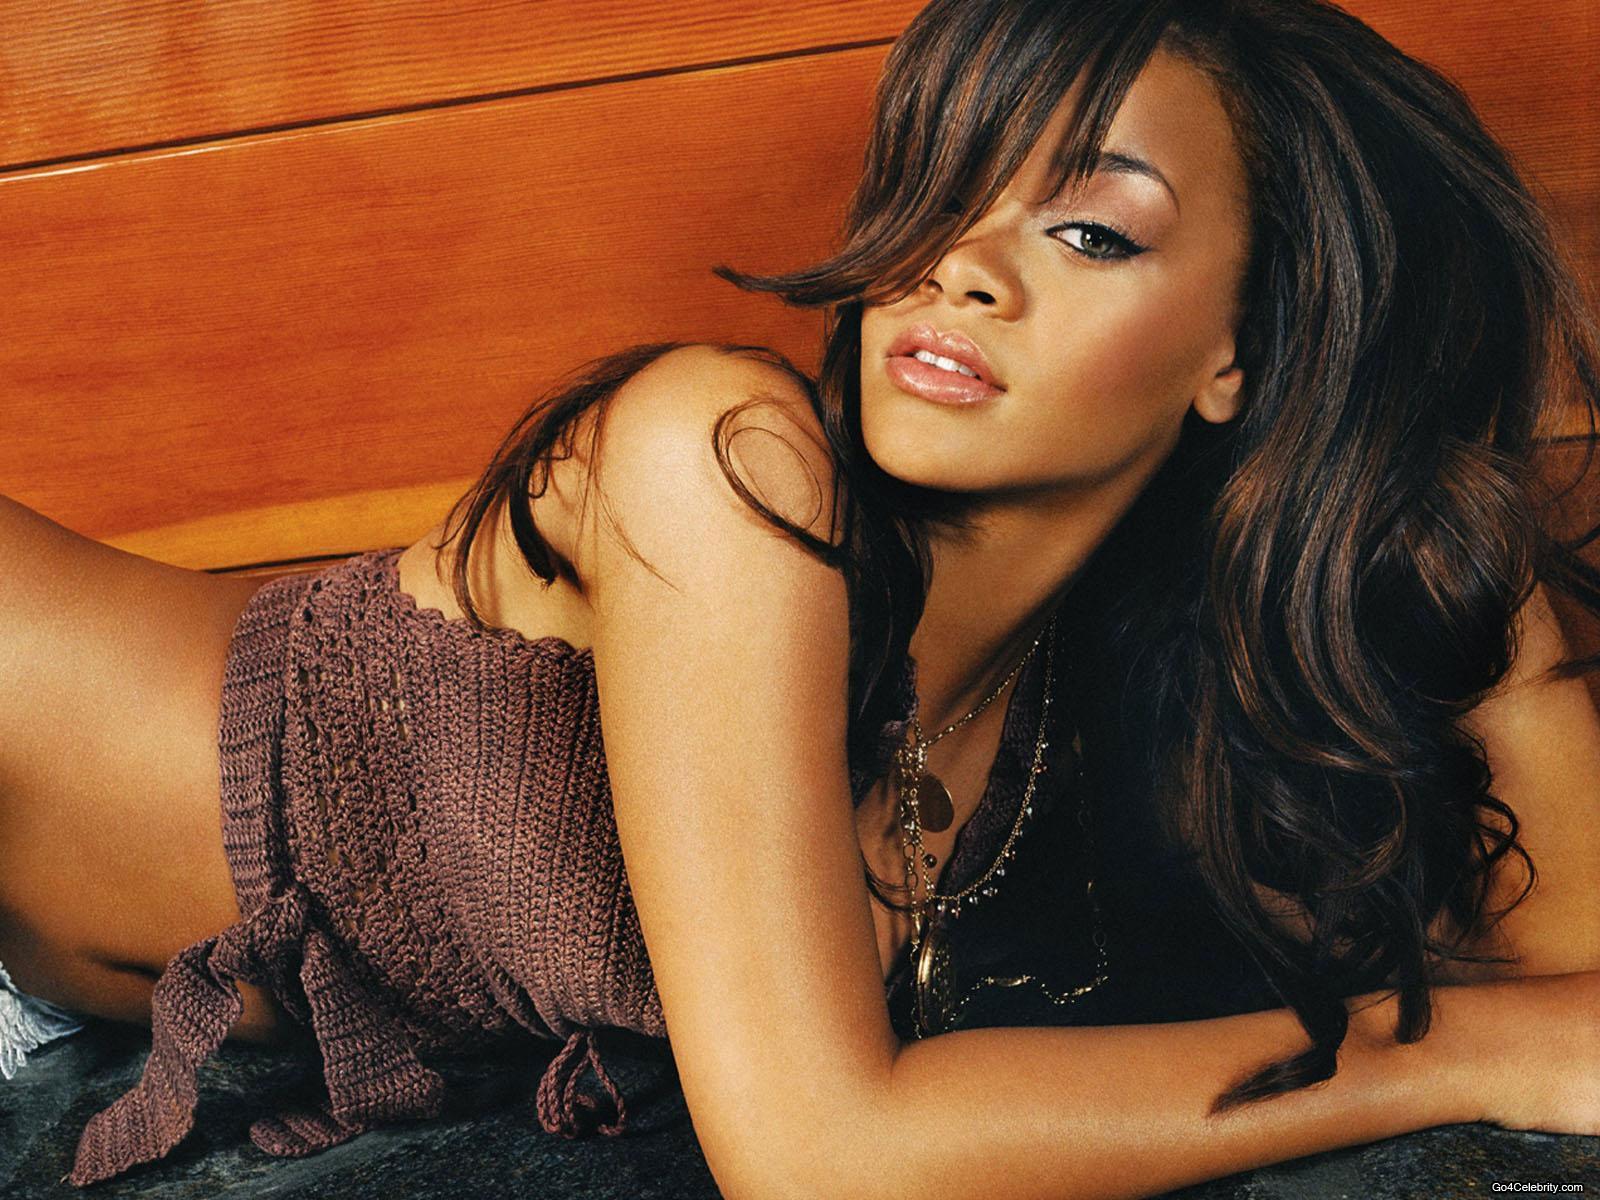 http://1.bp.blogspot.com/-SQAwHex2EaA/TWTR1E7dtLI/AAAAAAAABQw/8WvdYUO5WQM/s1600/Rihanna--i104760.jpg